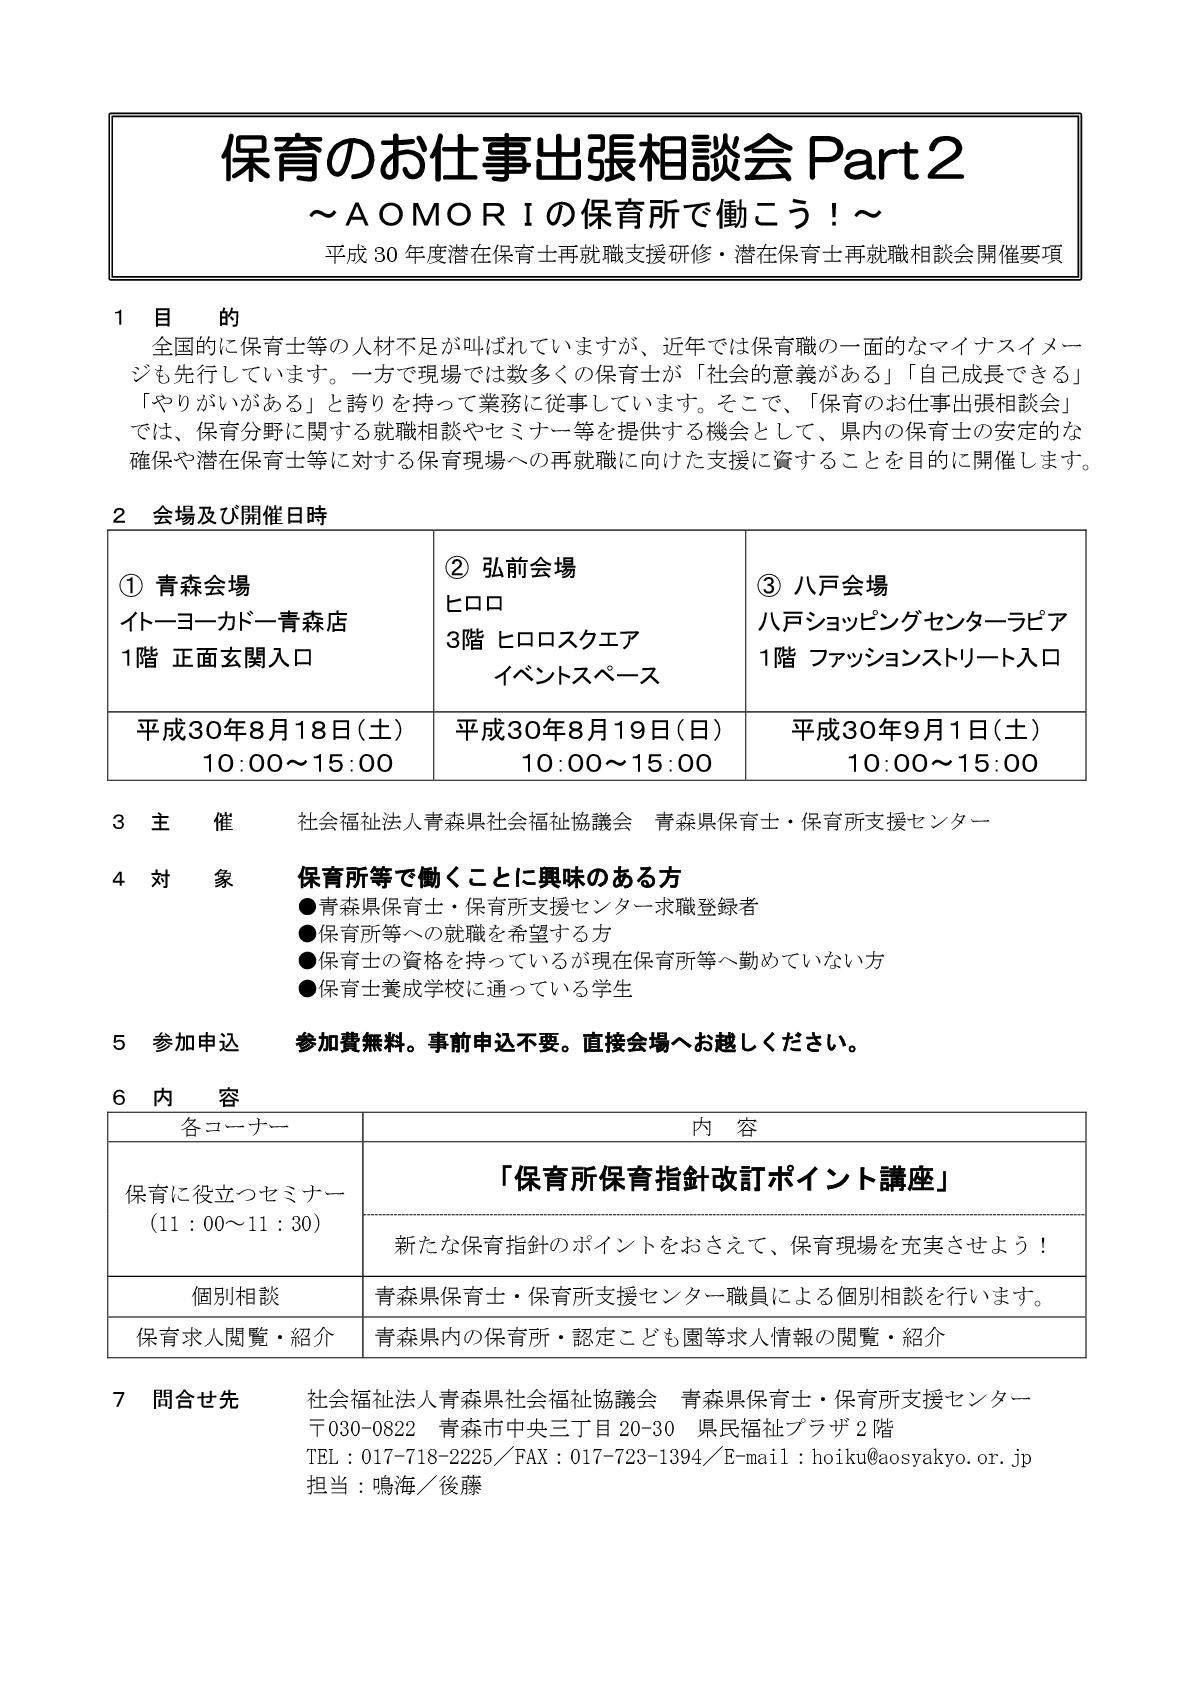 平成30年保育のお仕事出張相談会Part2:開催要項-001.jpg